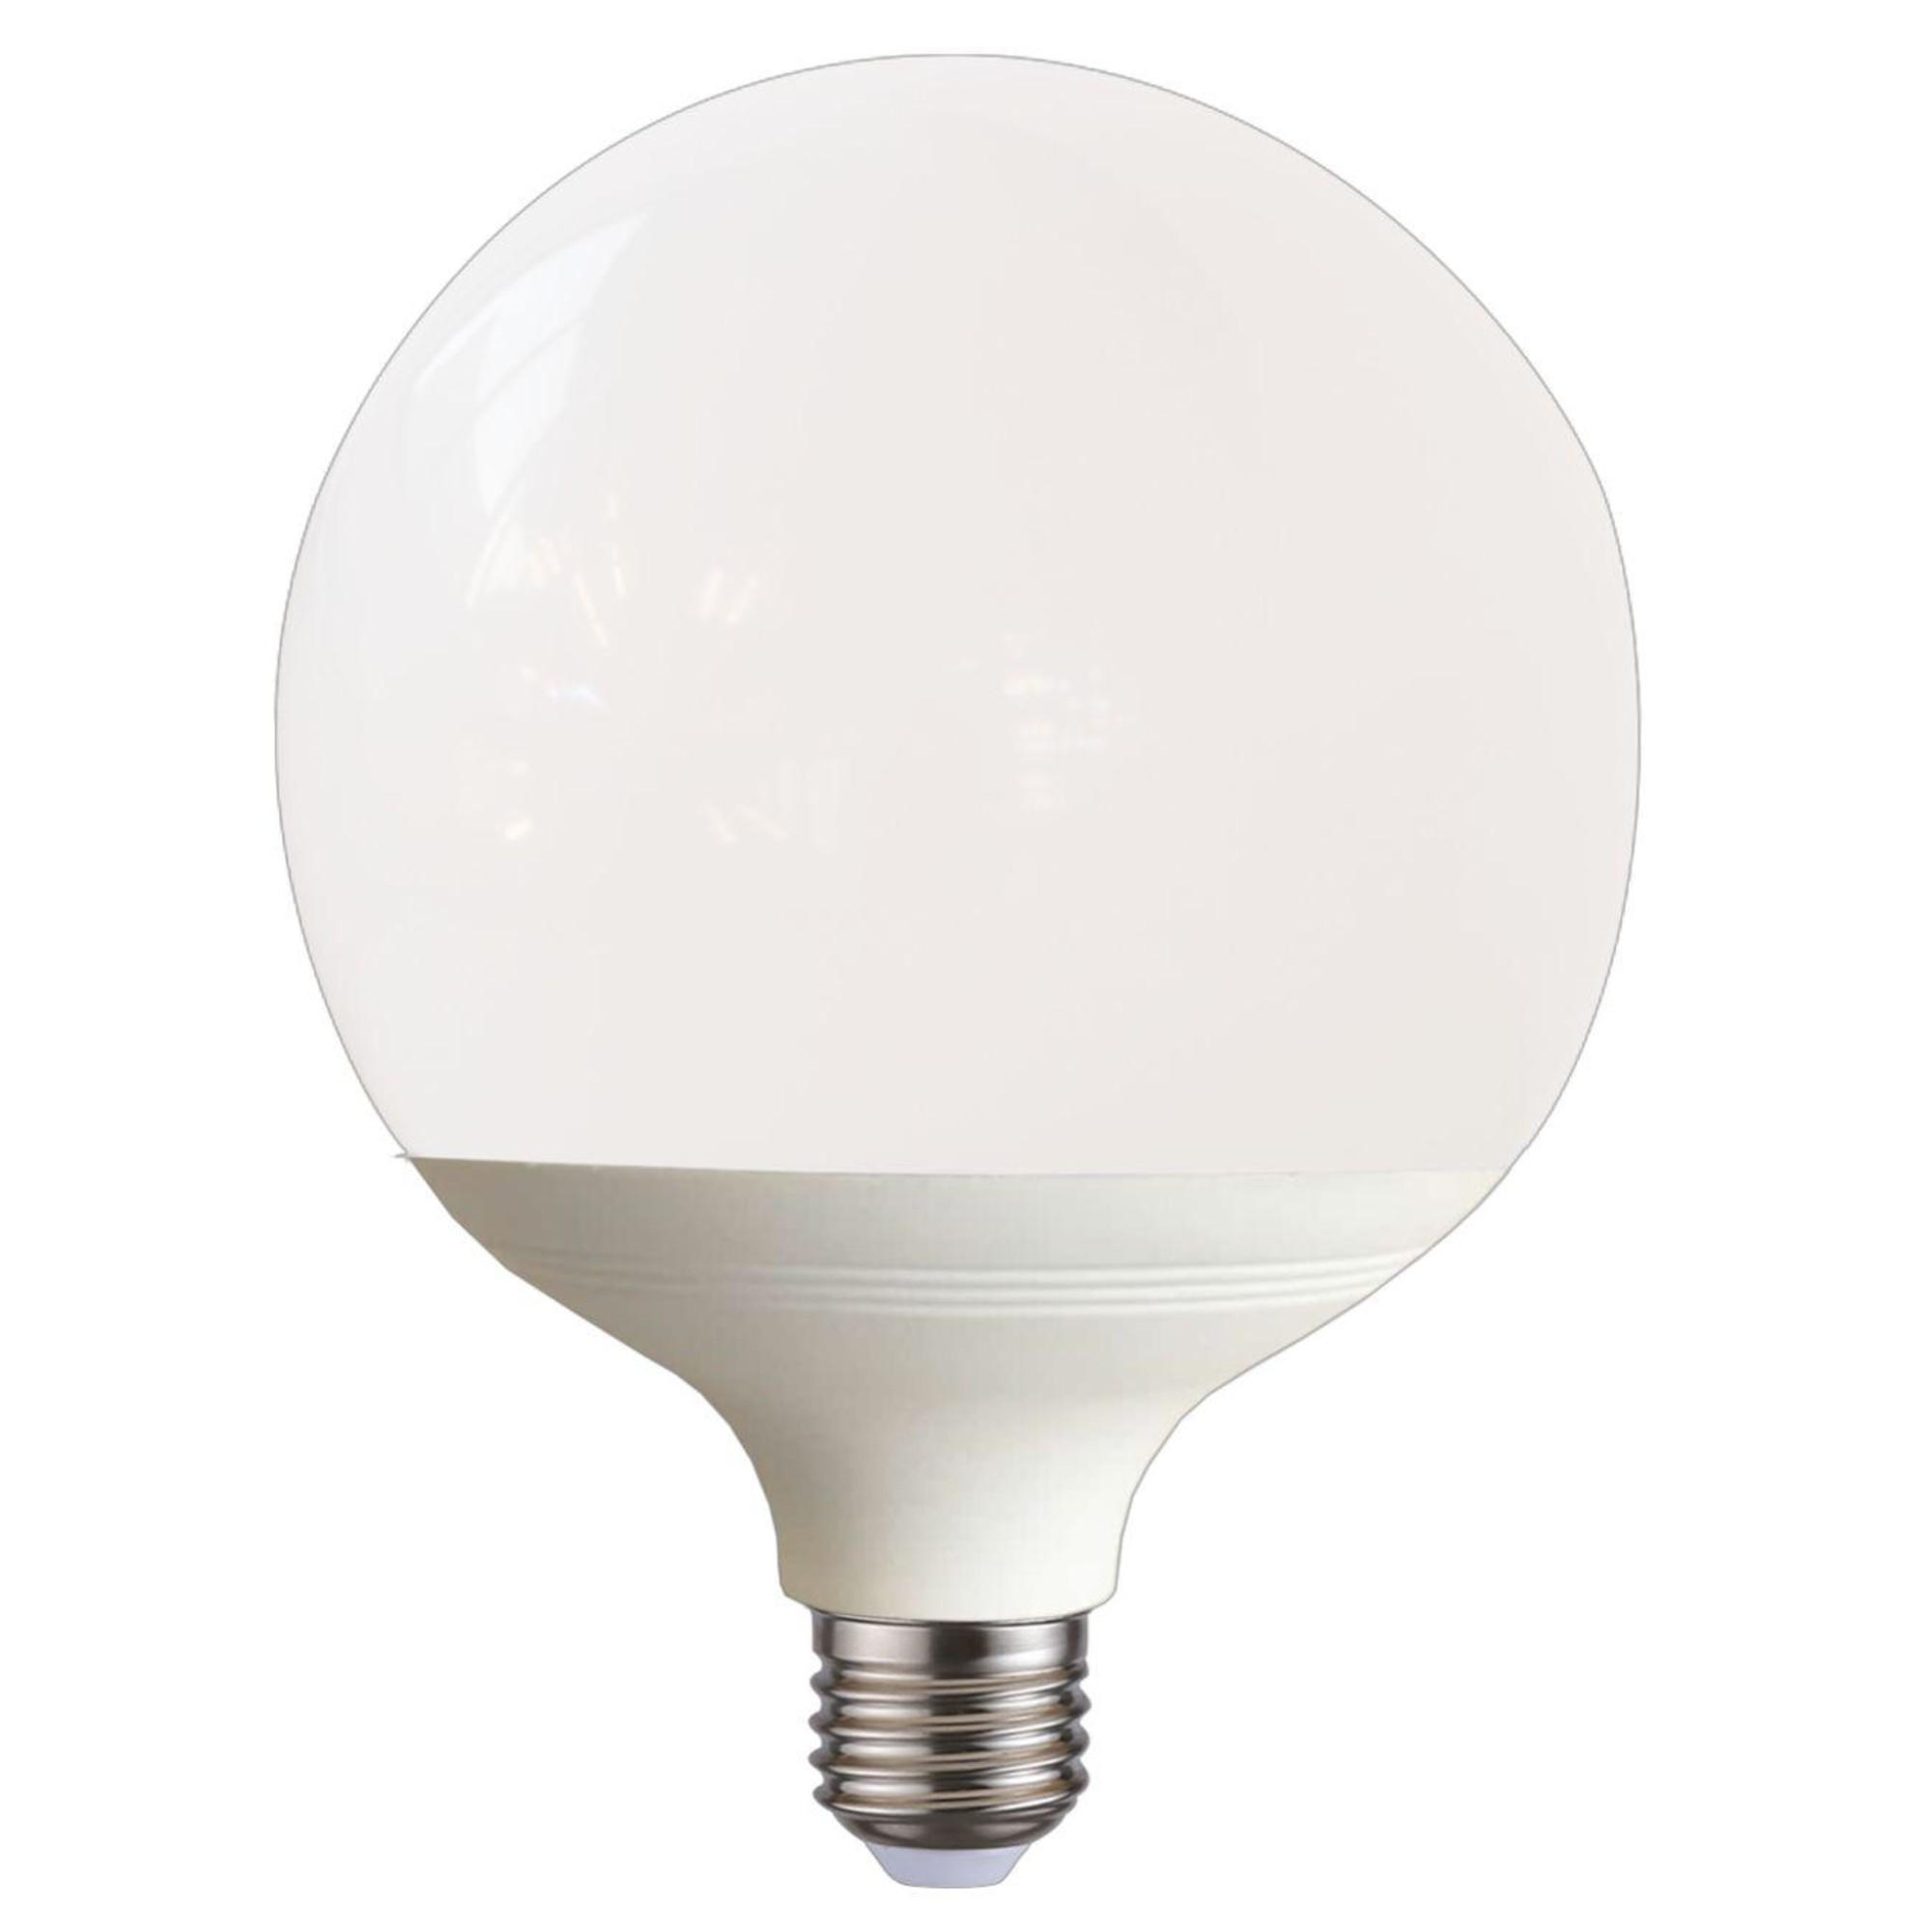 Лампа Ecola Premium светодионая E27 15.50 Вт шар 1240 Лм теплый свет